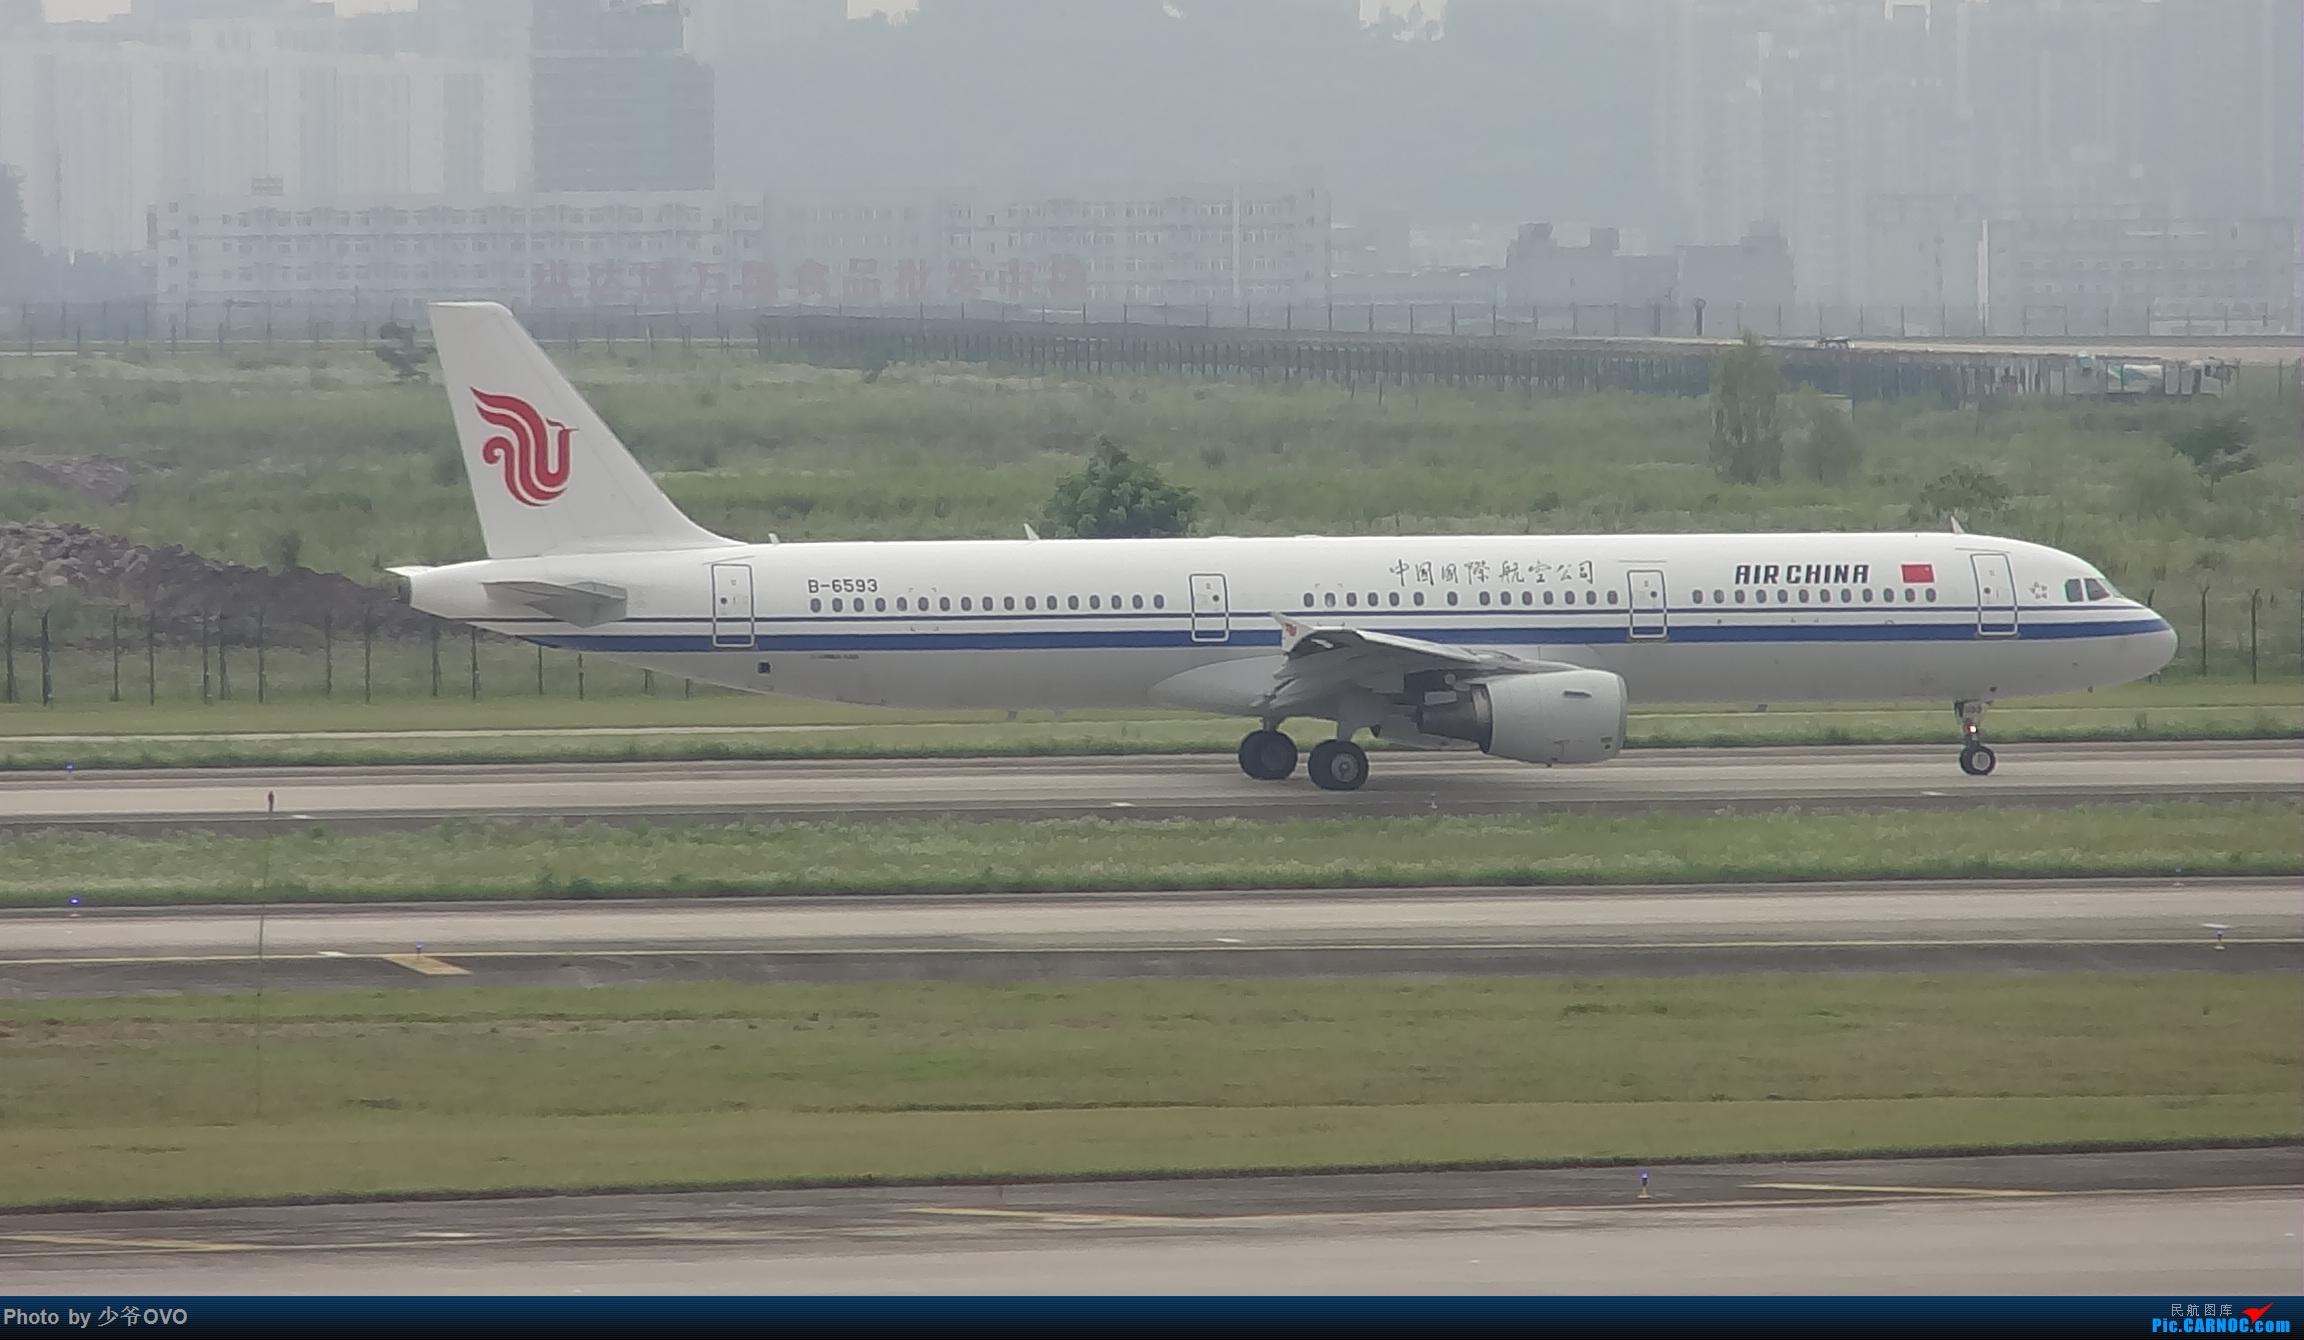 Re:[原创]CKG重庆江北机场拍机 ,中法建交50周年 AIRBUS A321-200 B-6593 中国重庆江北国际机场